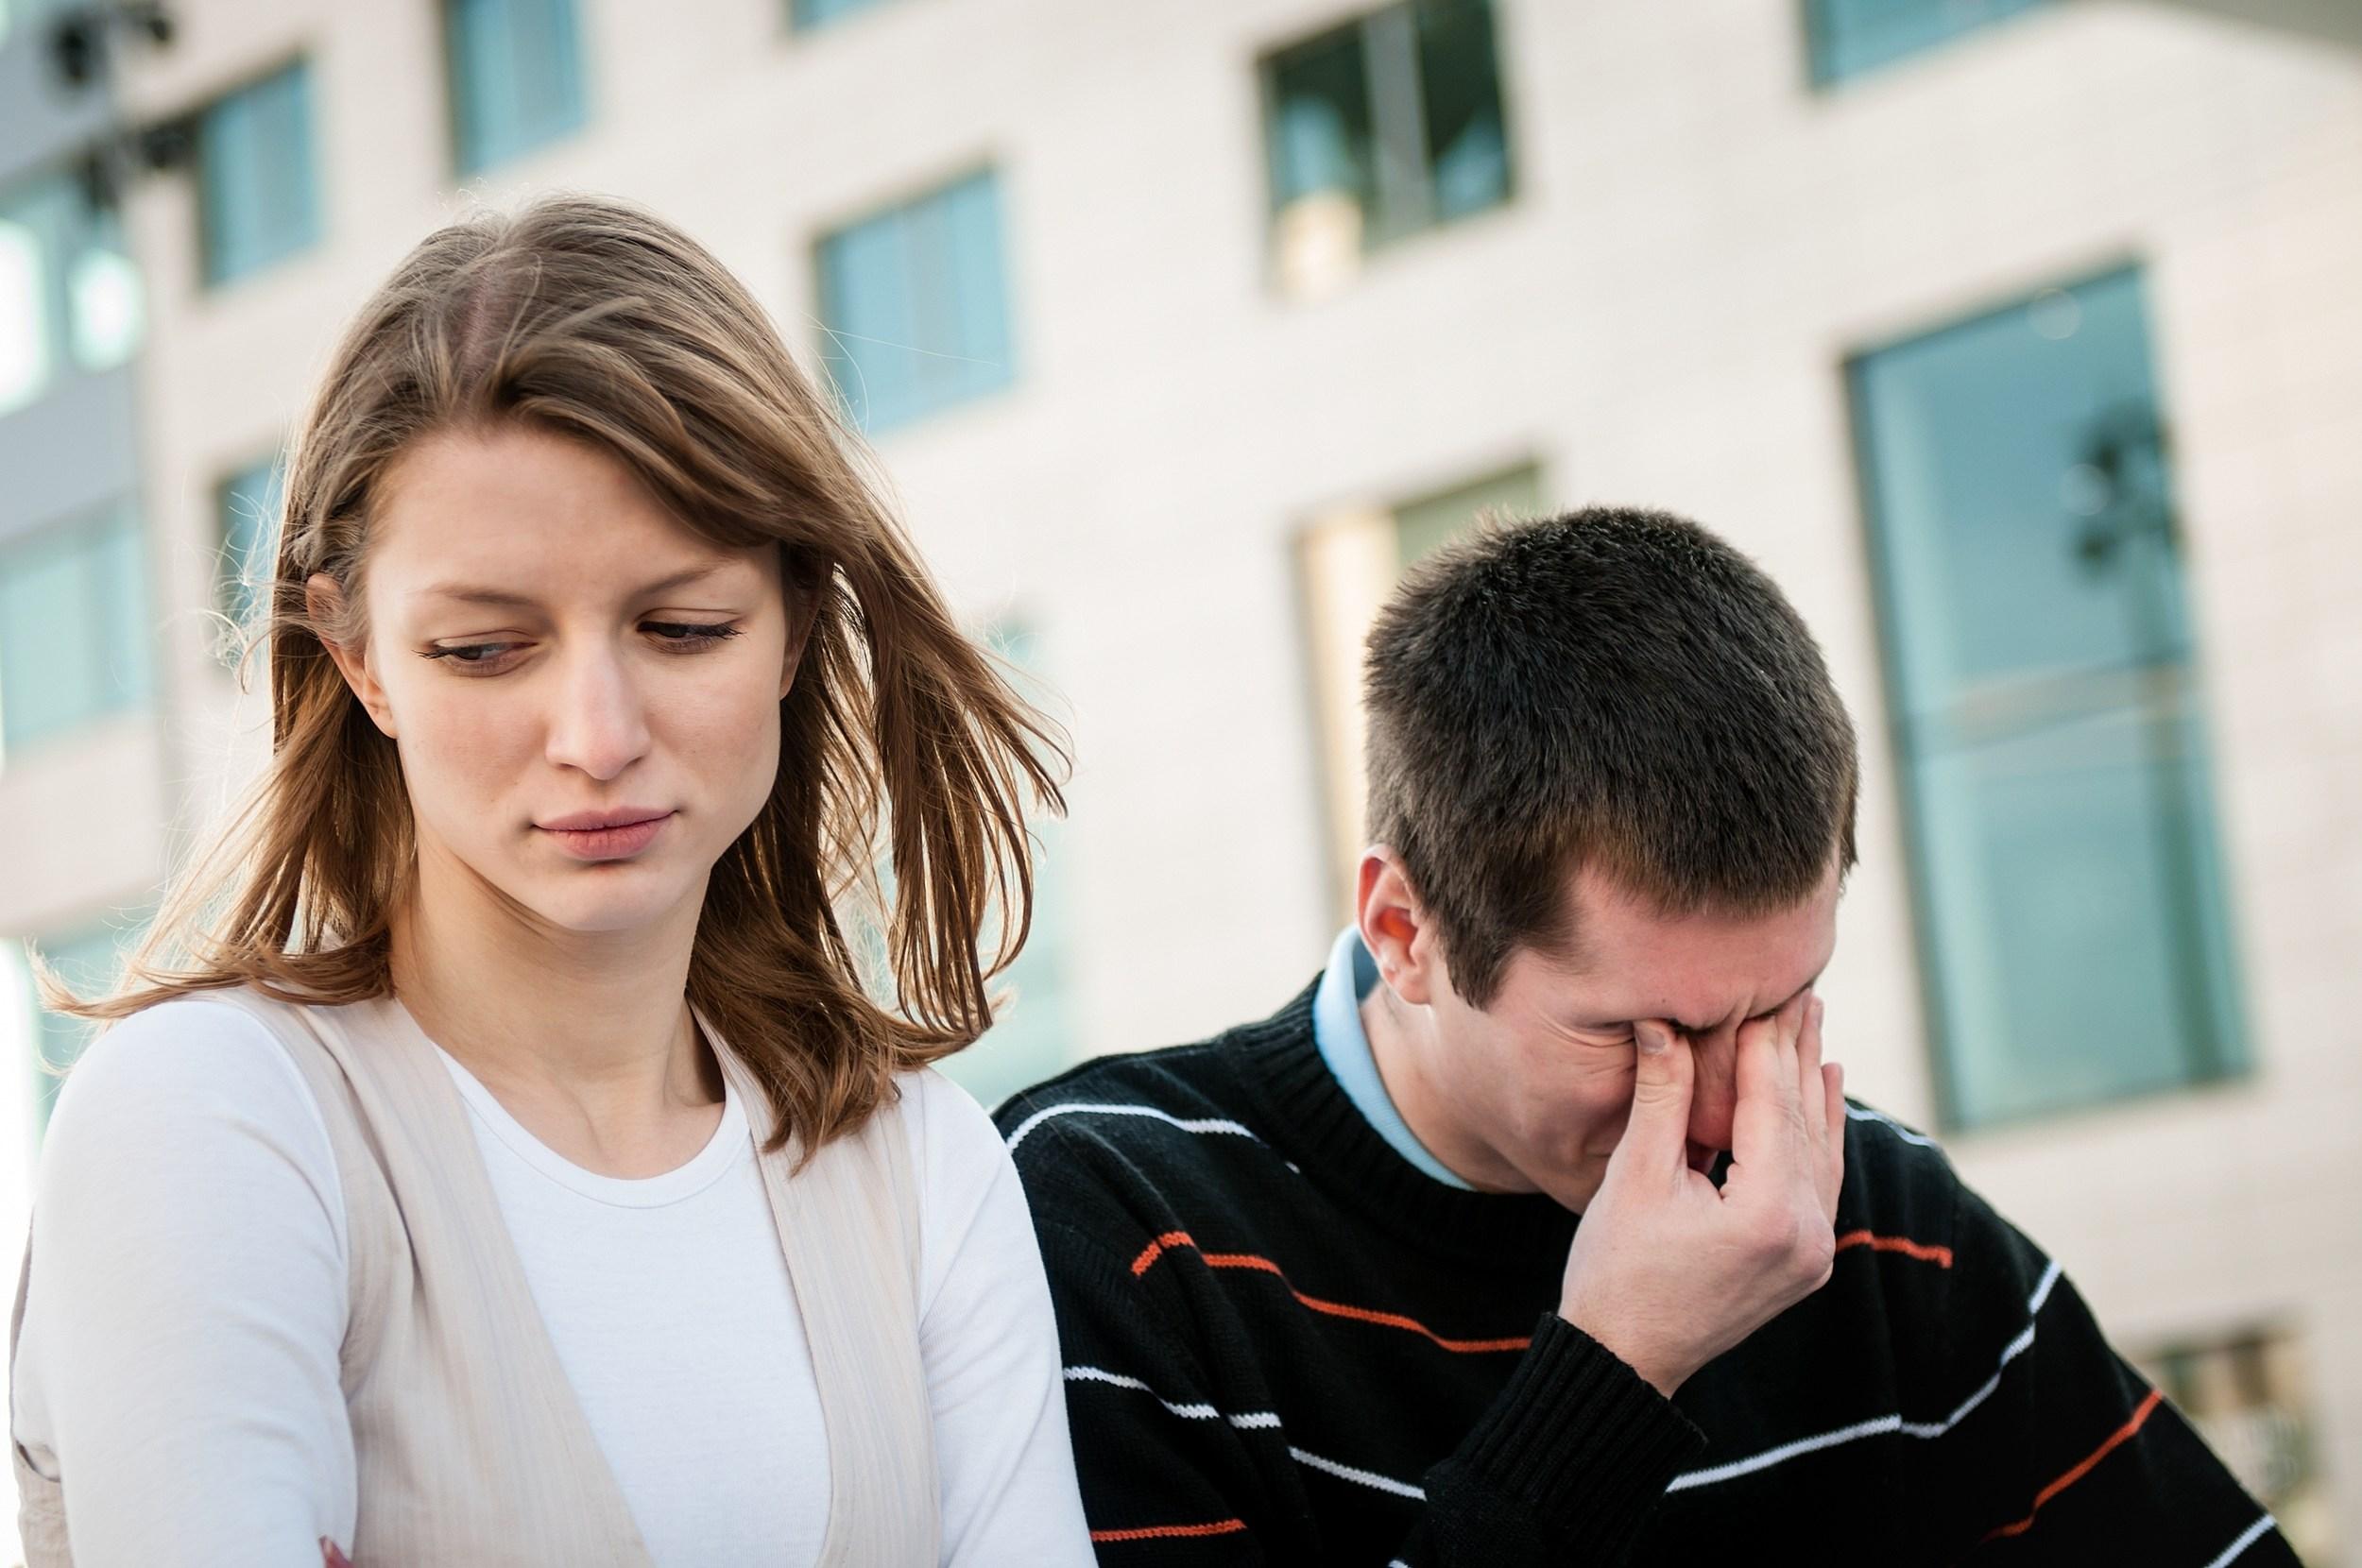 Image result for Divorce istock